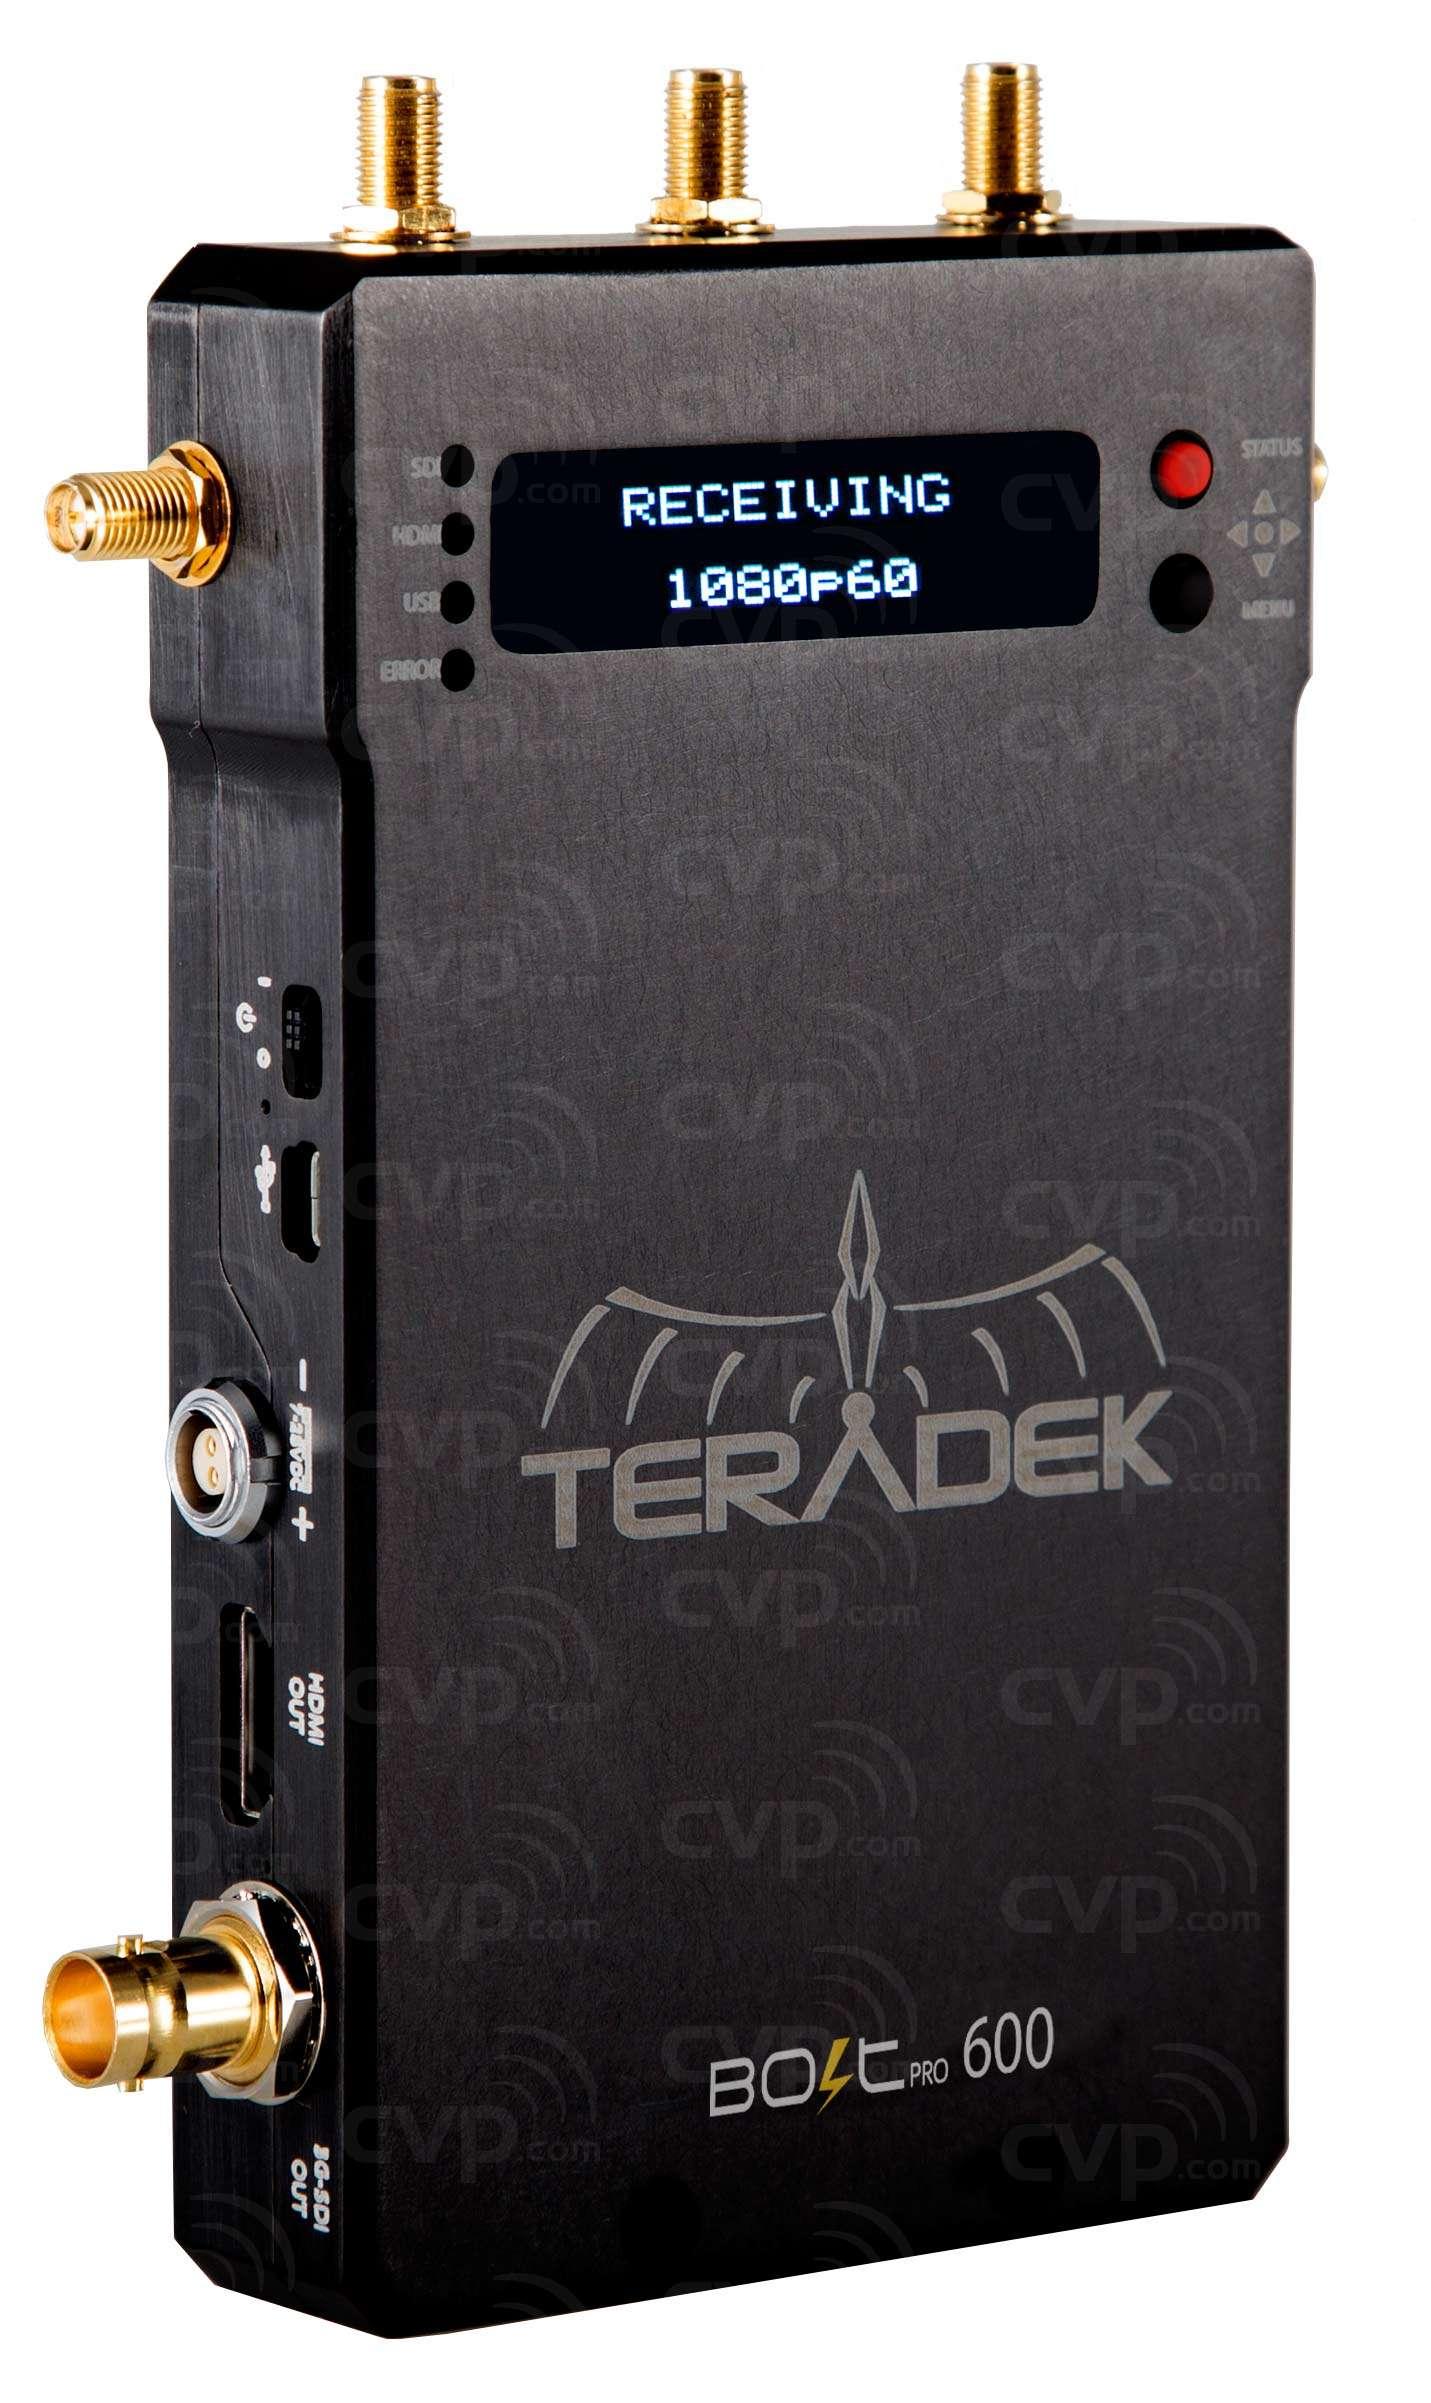 Teradek Bolt Pro 600 - Uncompressed Wireless HD Video Transmitter